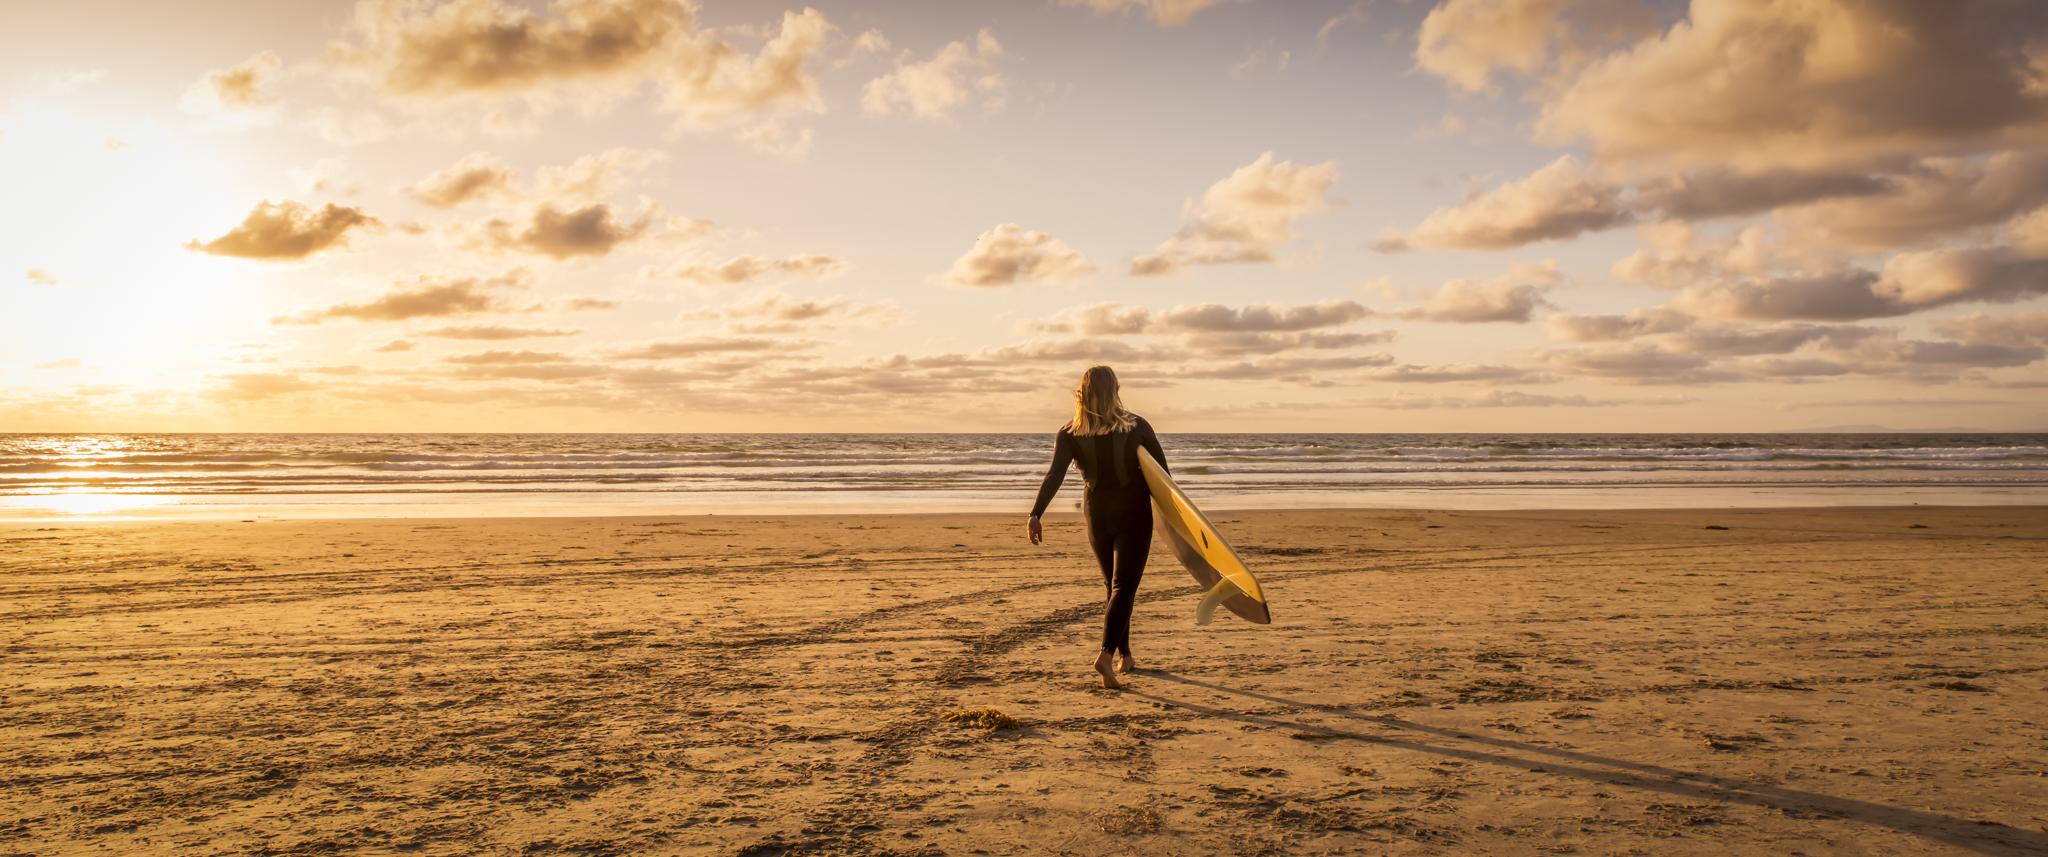 Chica Surf al atardecer - 2048x857